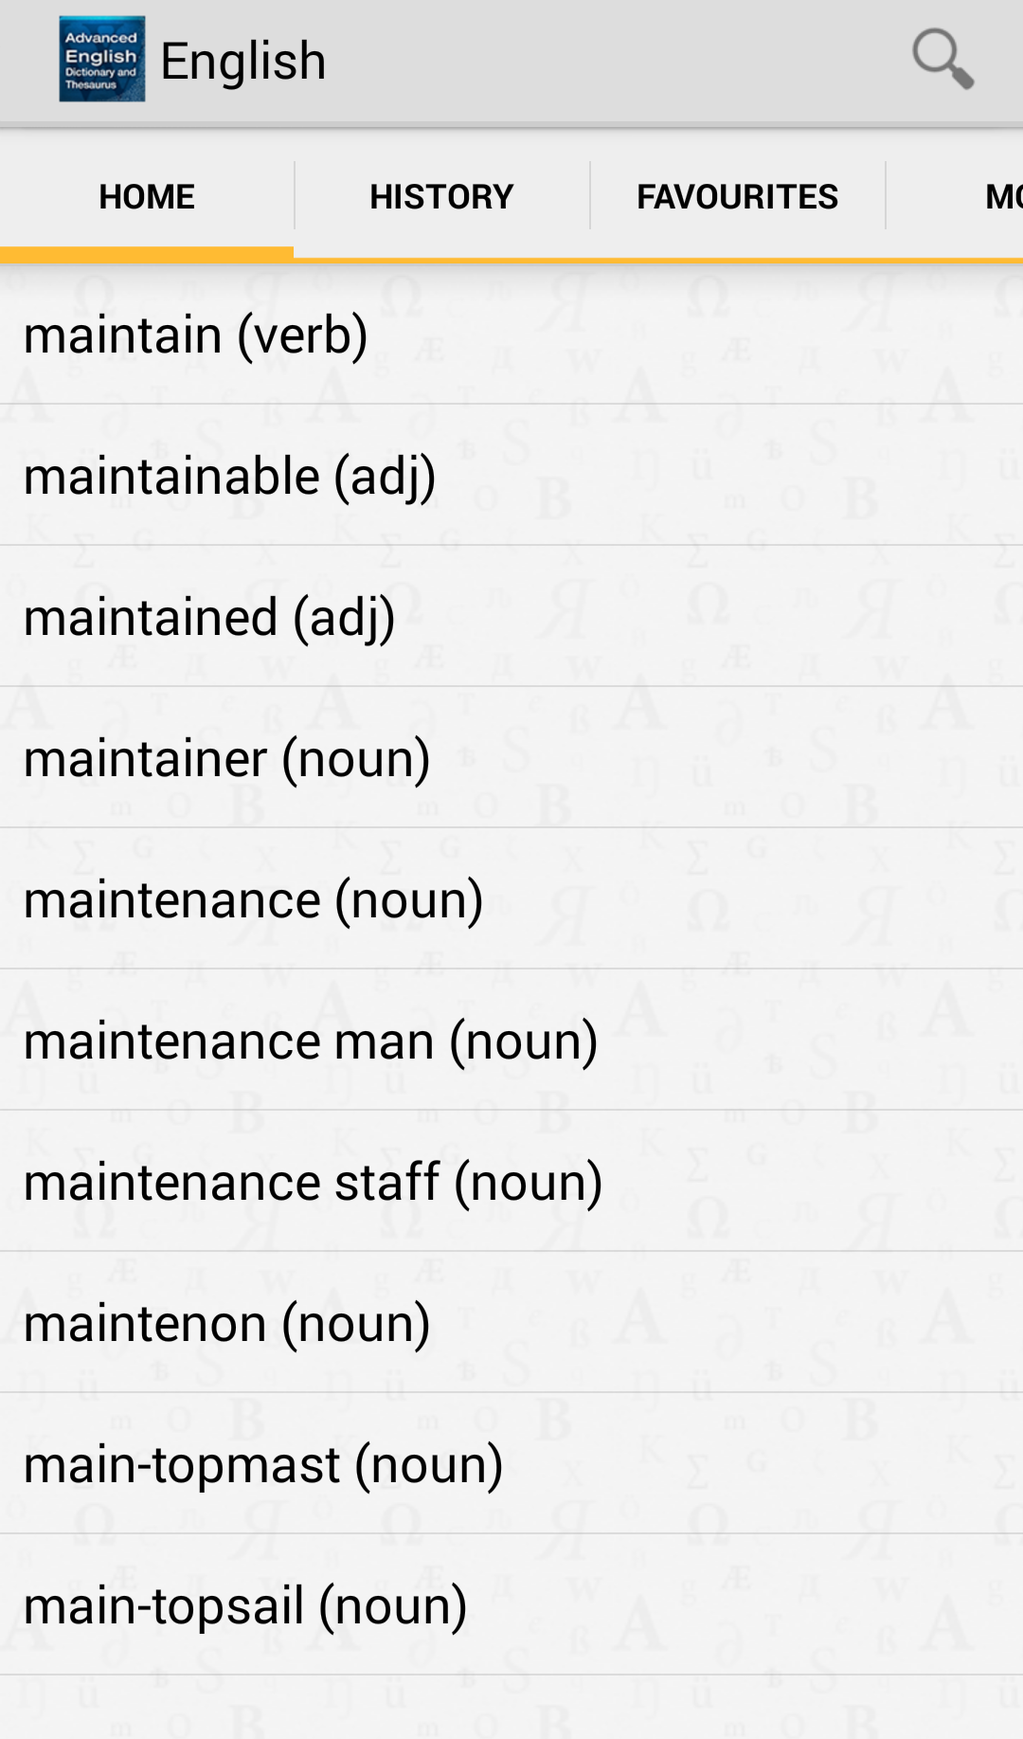 Advanced English Dictionary & Thesaurus Screenshot 13